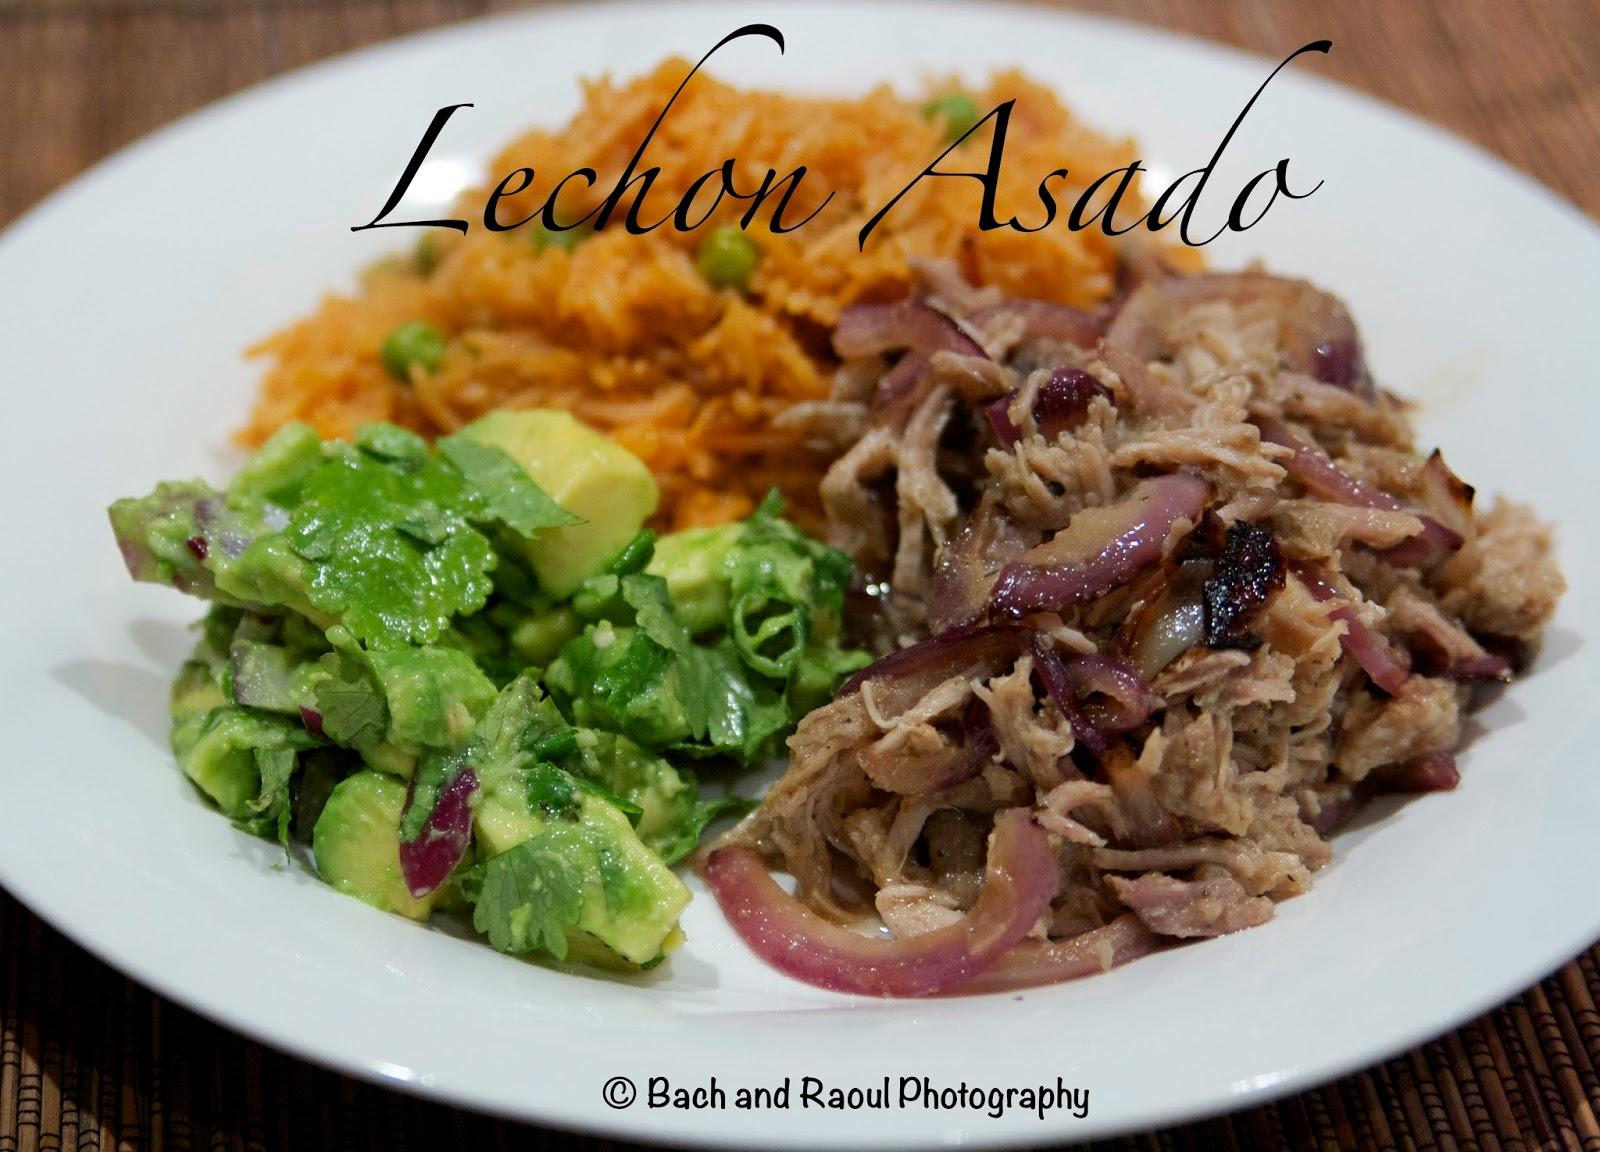 Lechon Asado - Slow cooked Cuban Pork